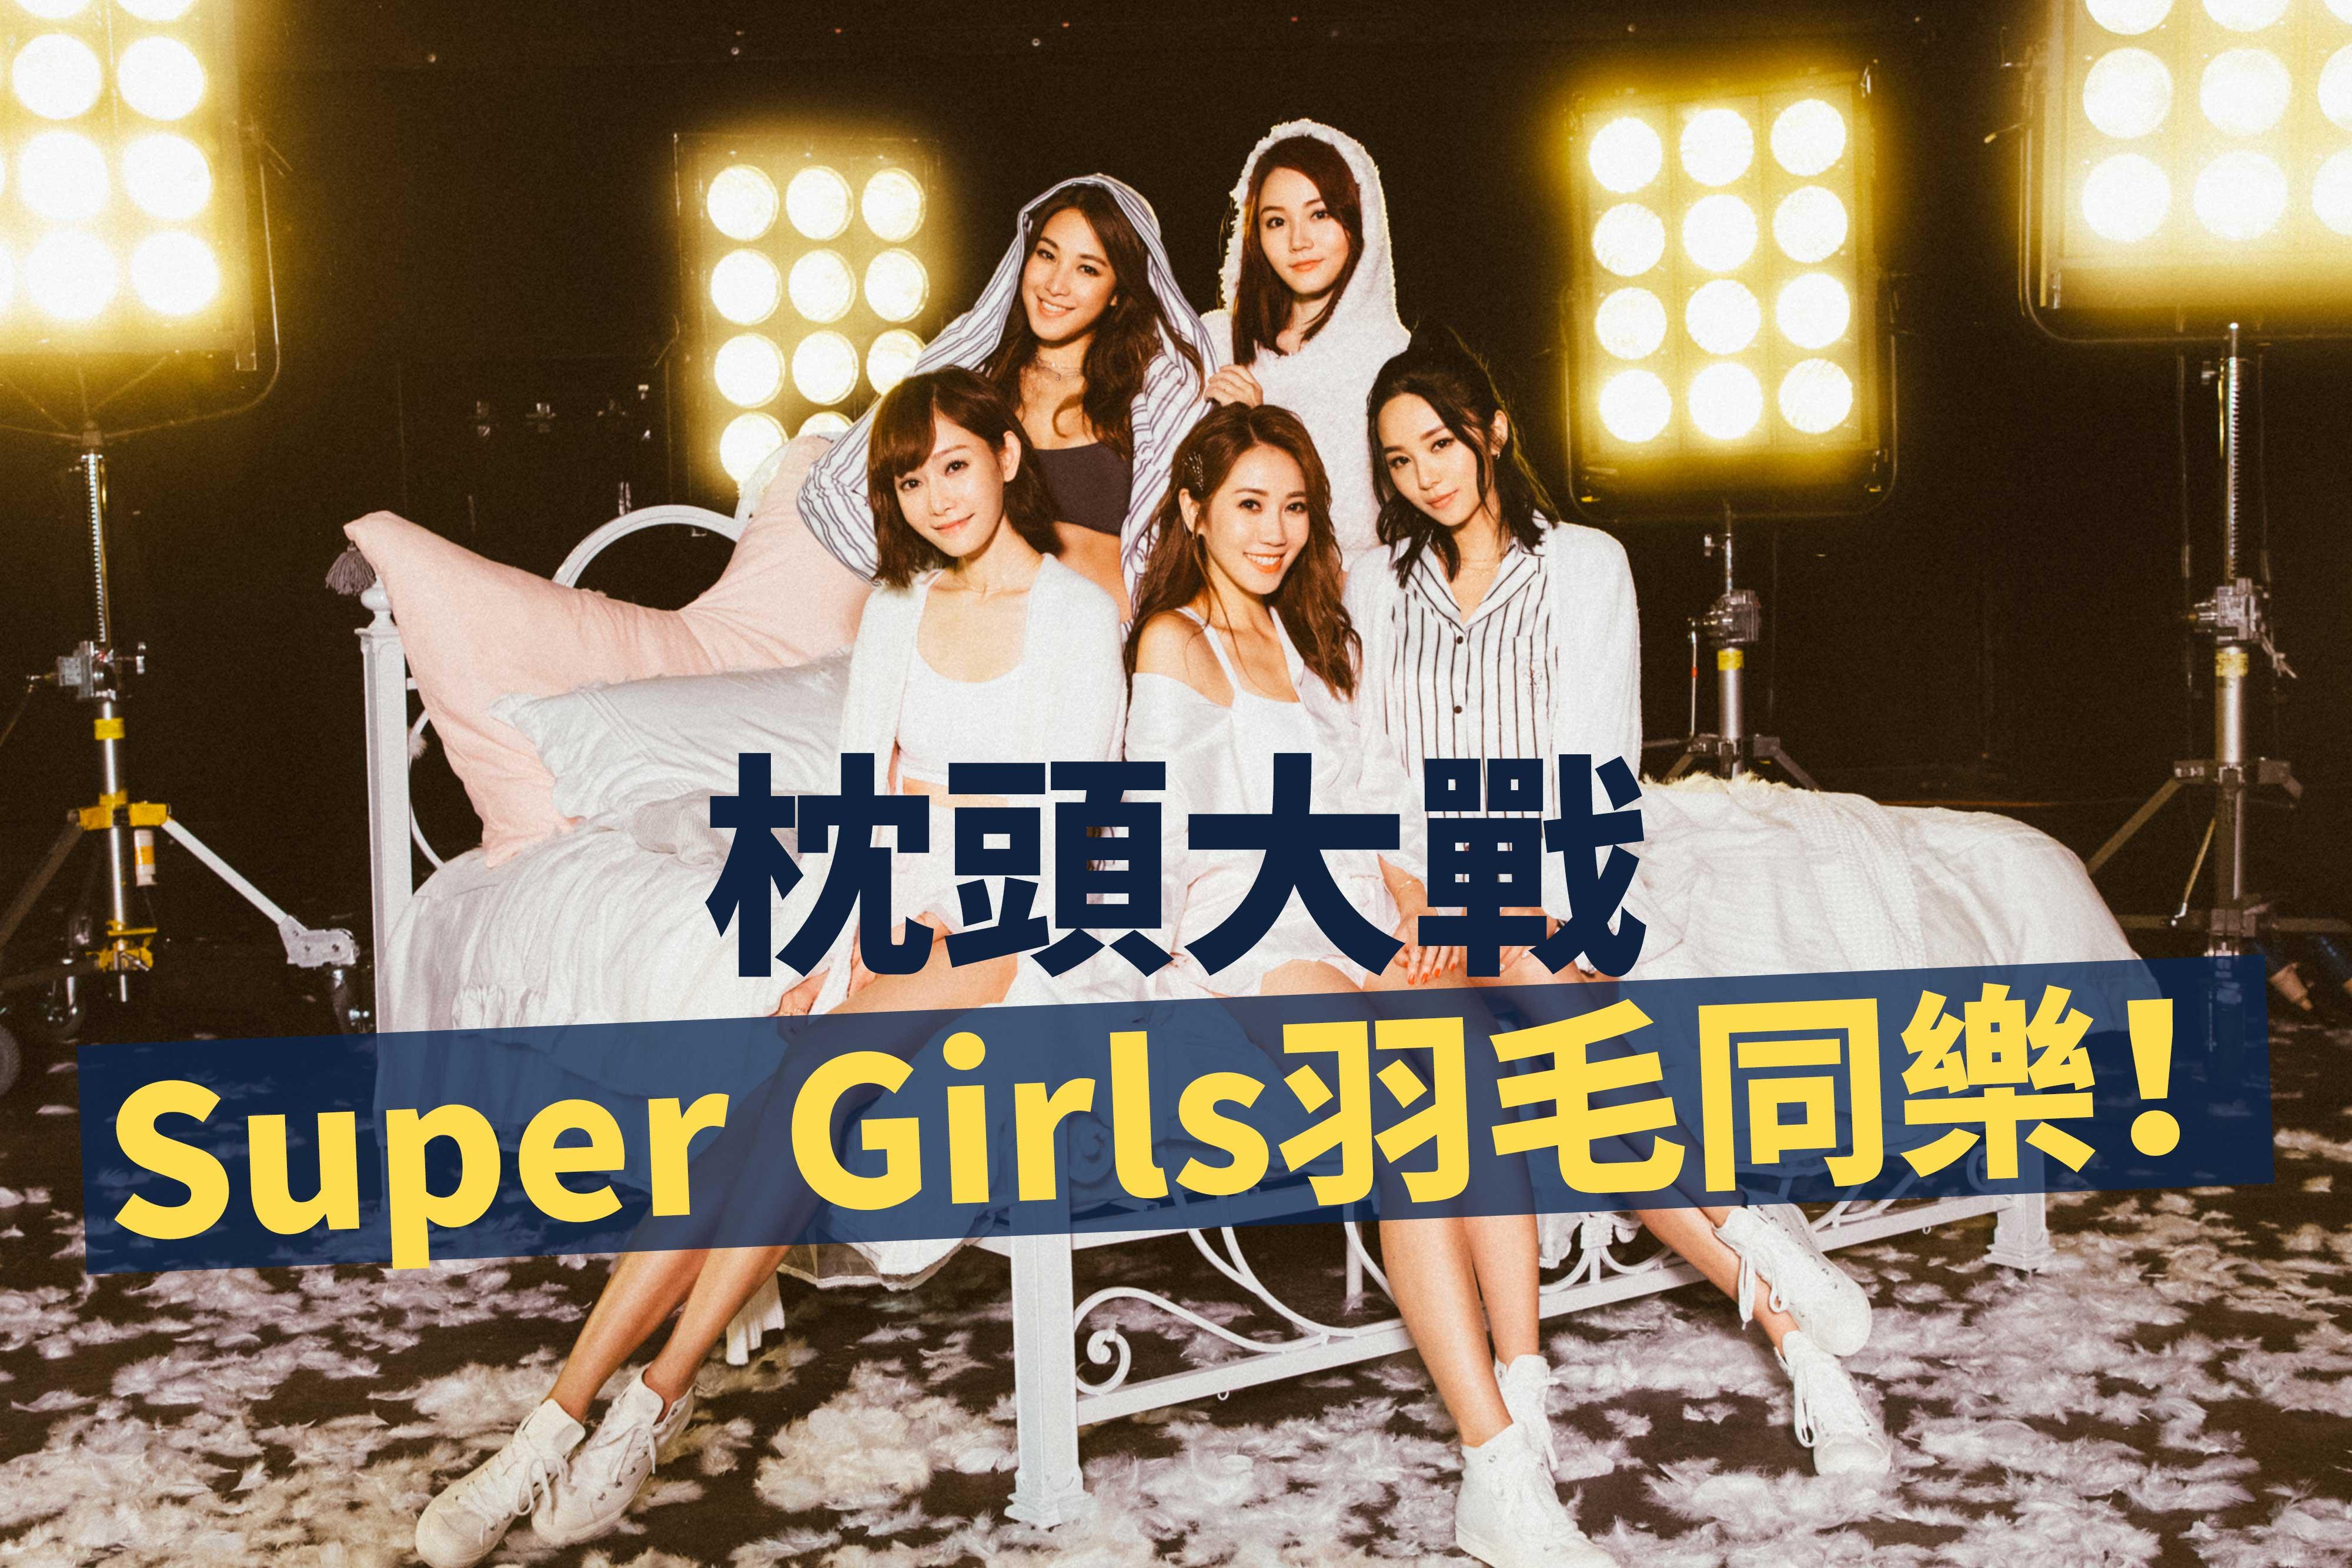 Super Girls爆枕頭大戰 羽毛同樂!